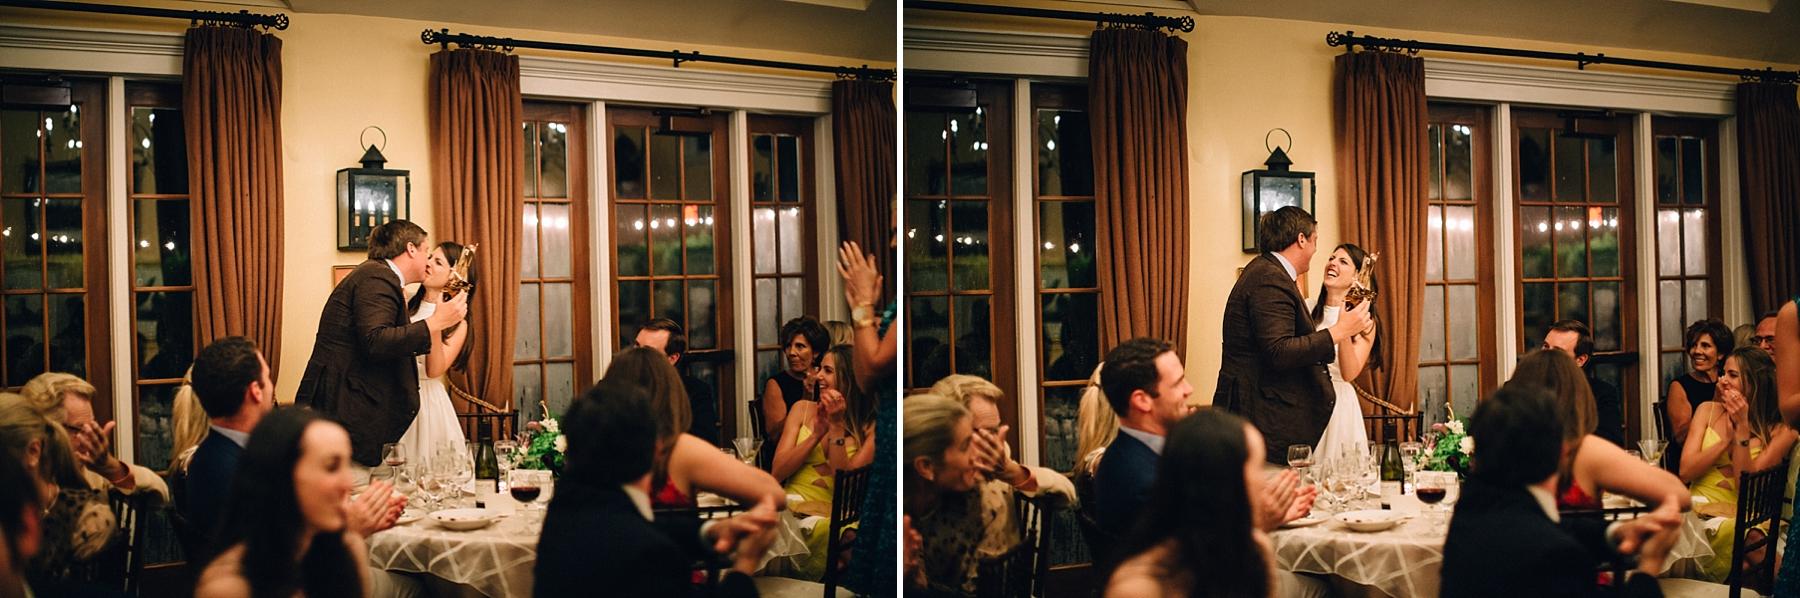 mashomack-preserve-polo-club-wedding-ny-photographer_0001.jpg